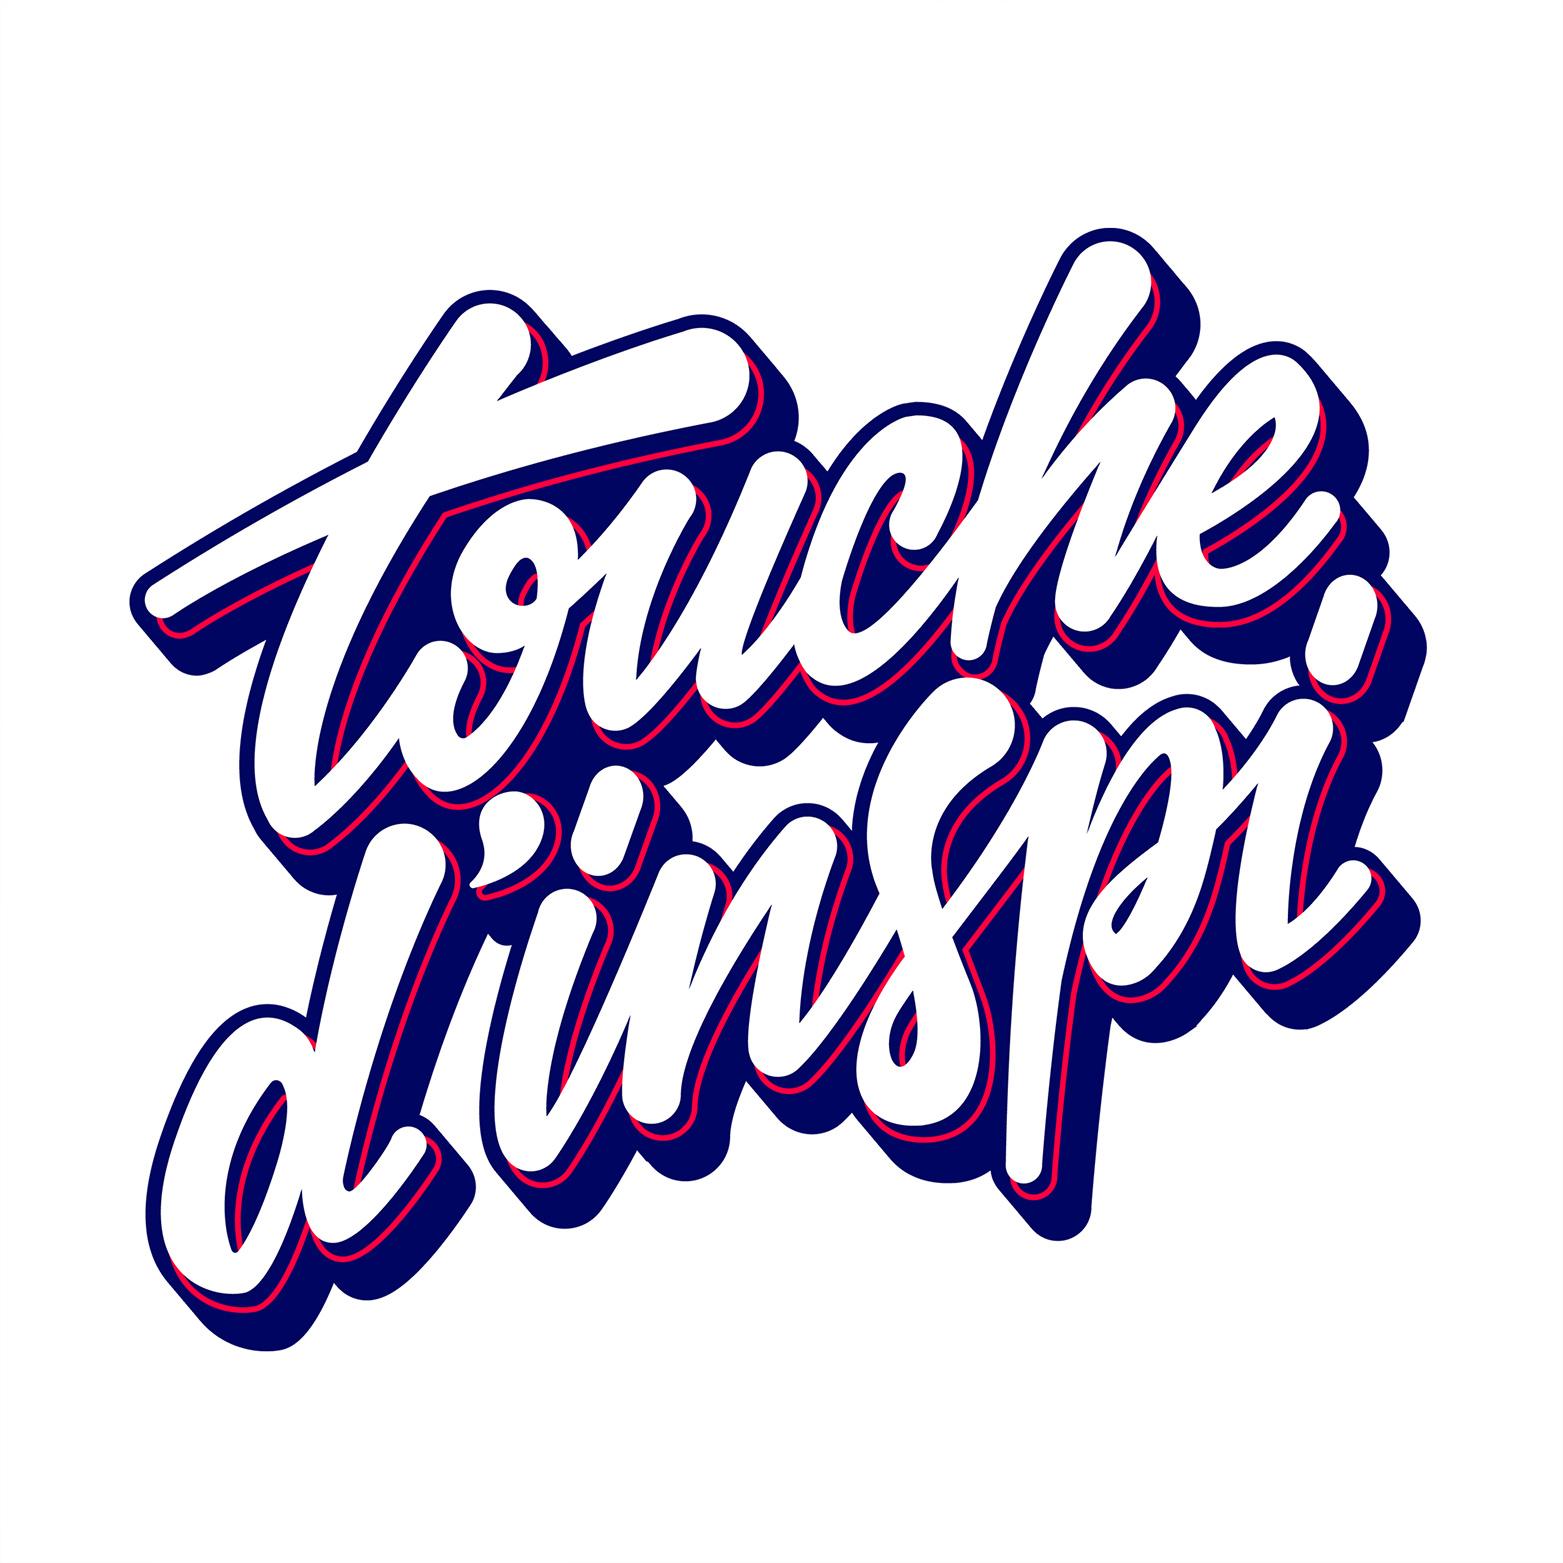 touche-dinspi